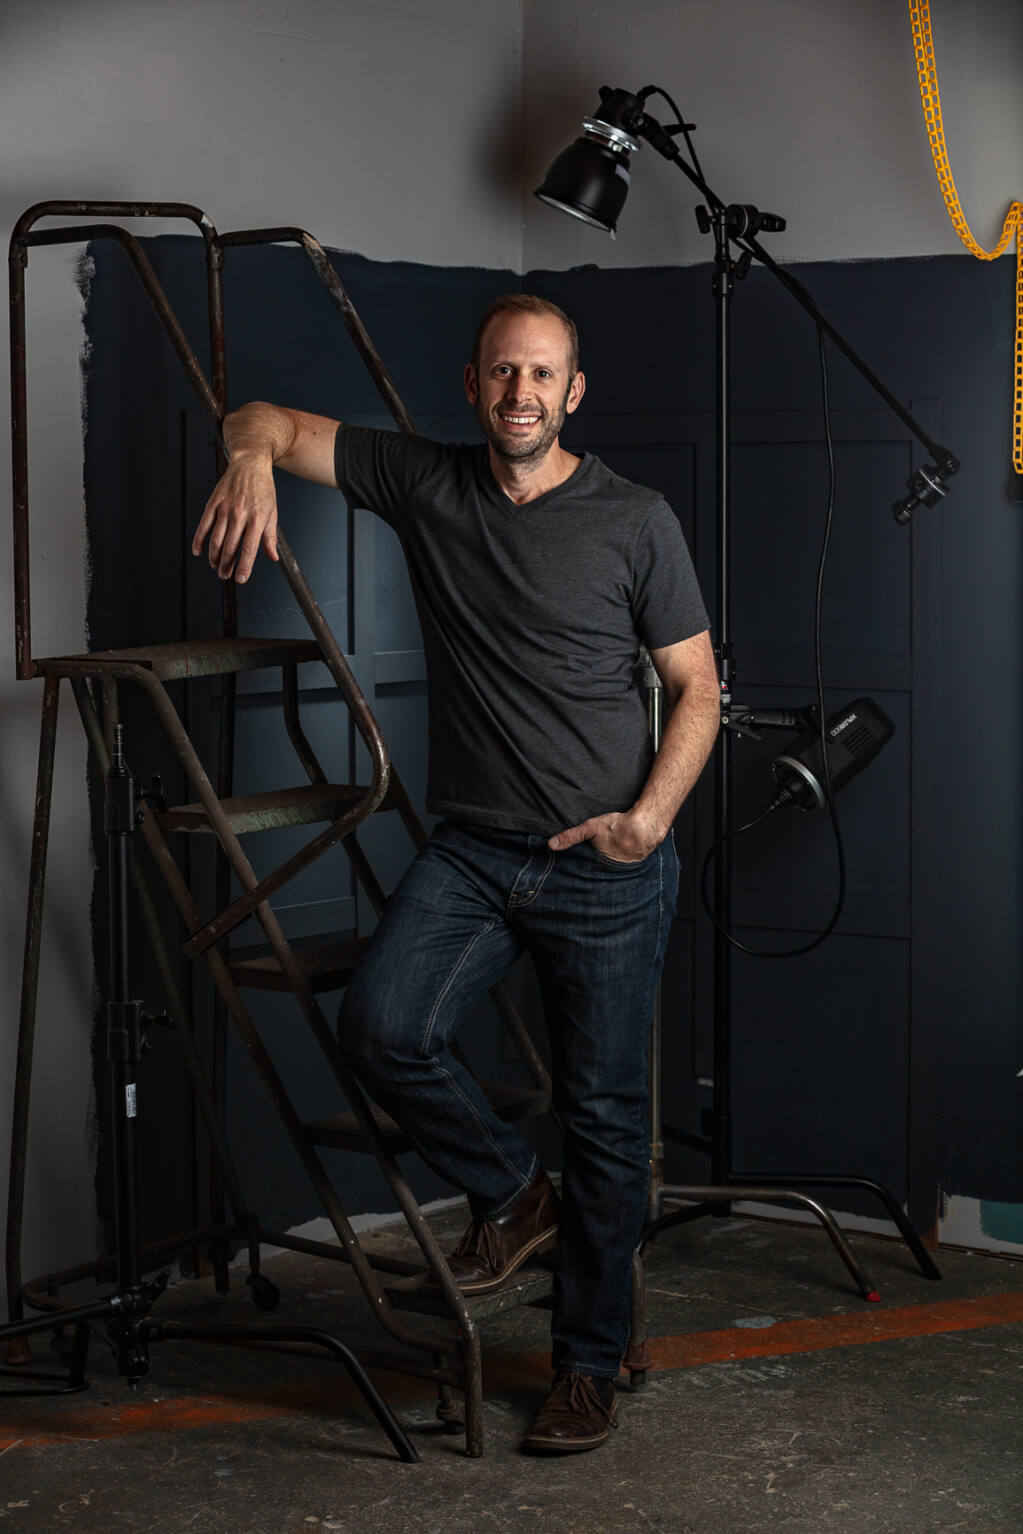 Jason Tinacci, Sonoma photographer